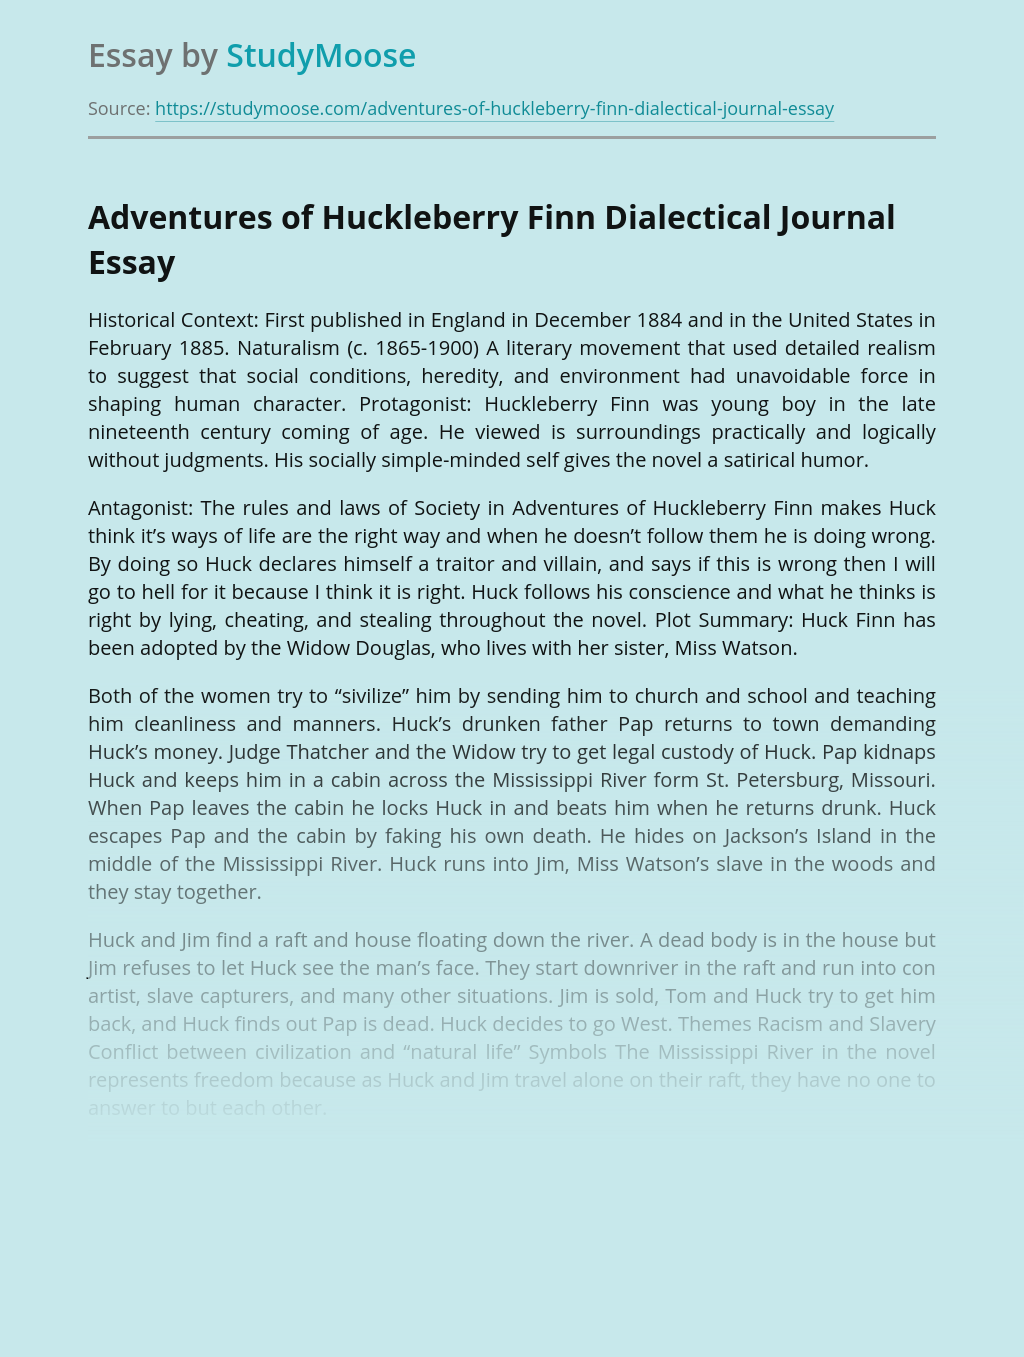 Adventures of Huckleberry Finn Dialectical Journal